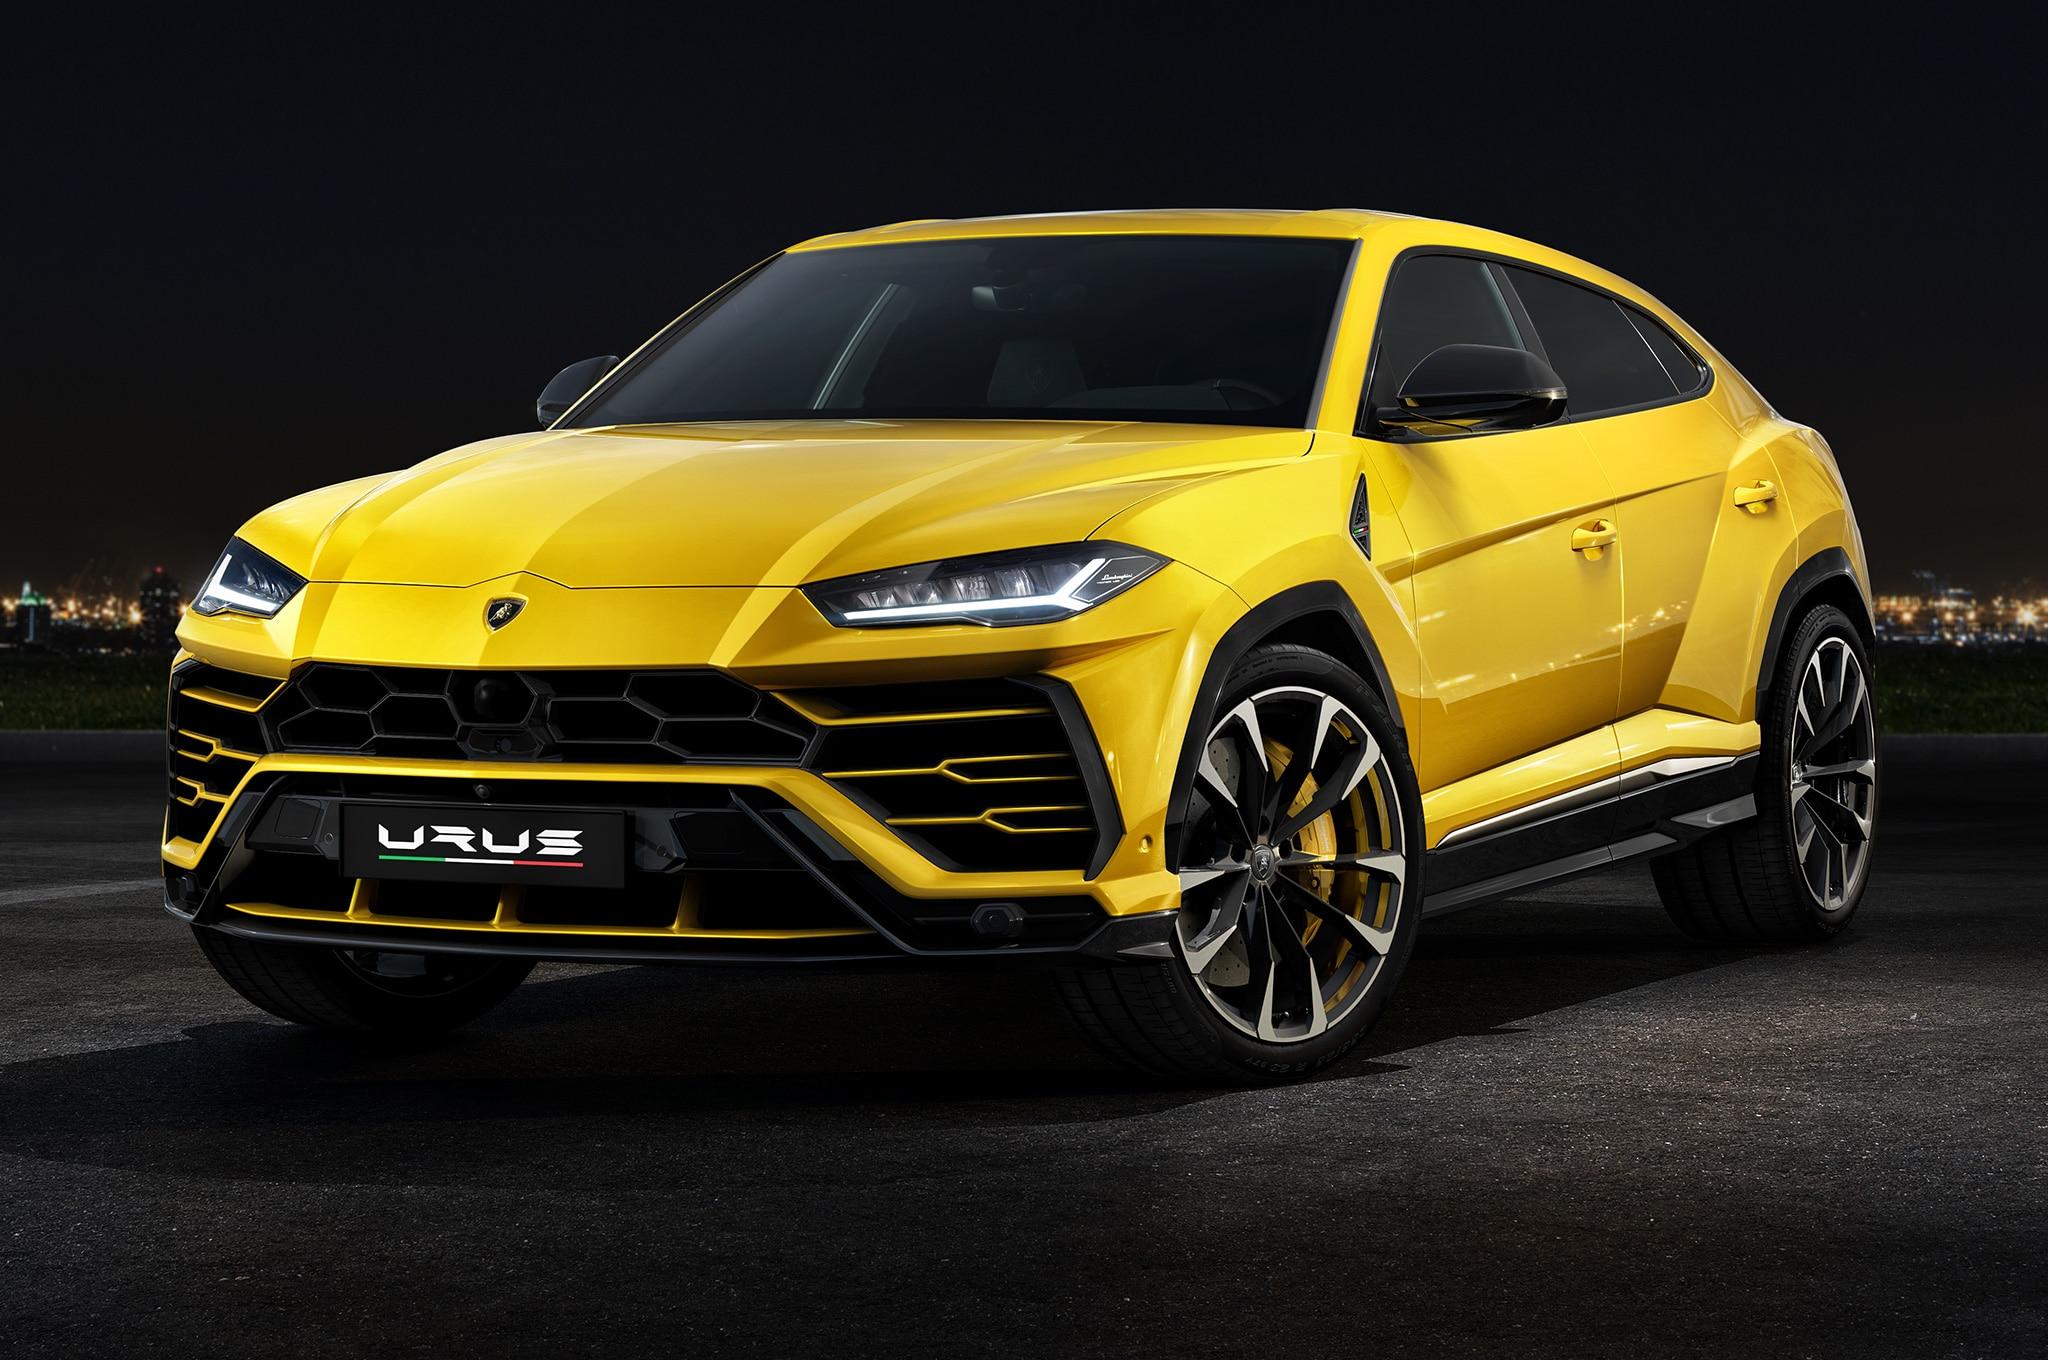 2019-Lamborghini-Urus-front-side-view.jpg